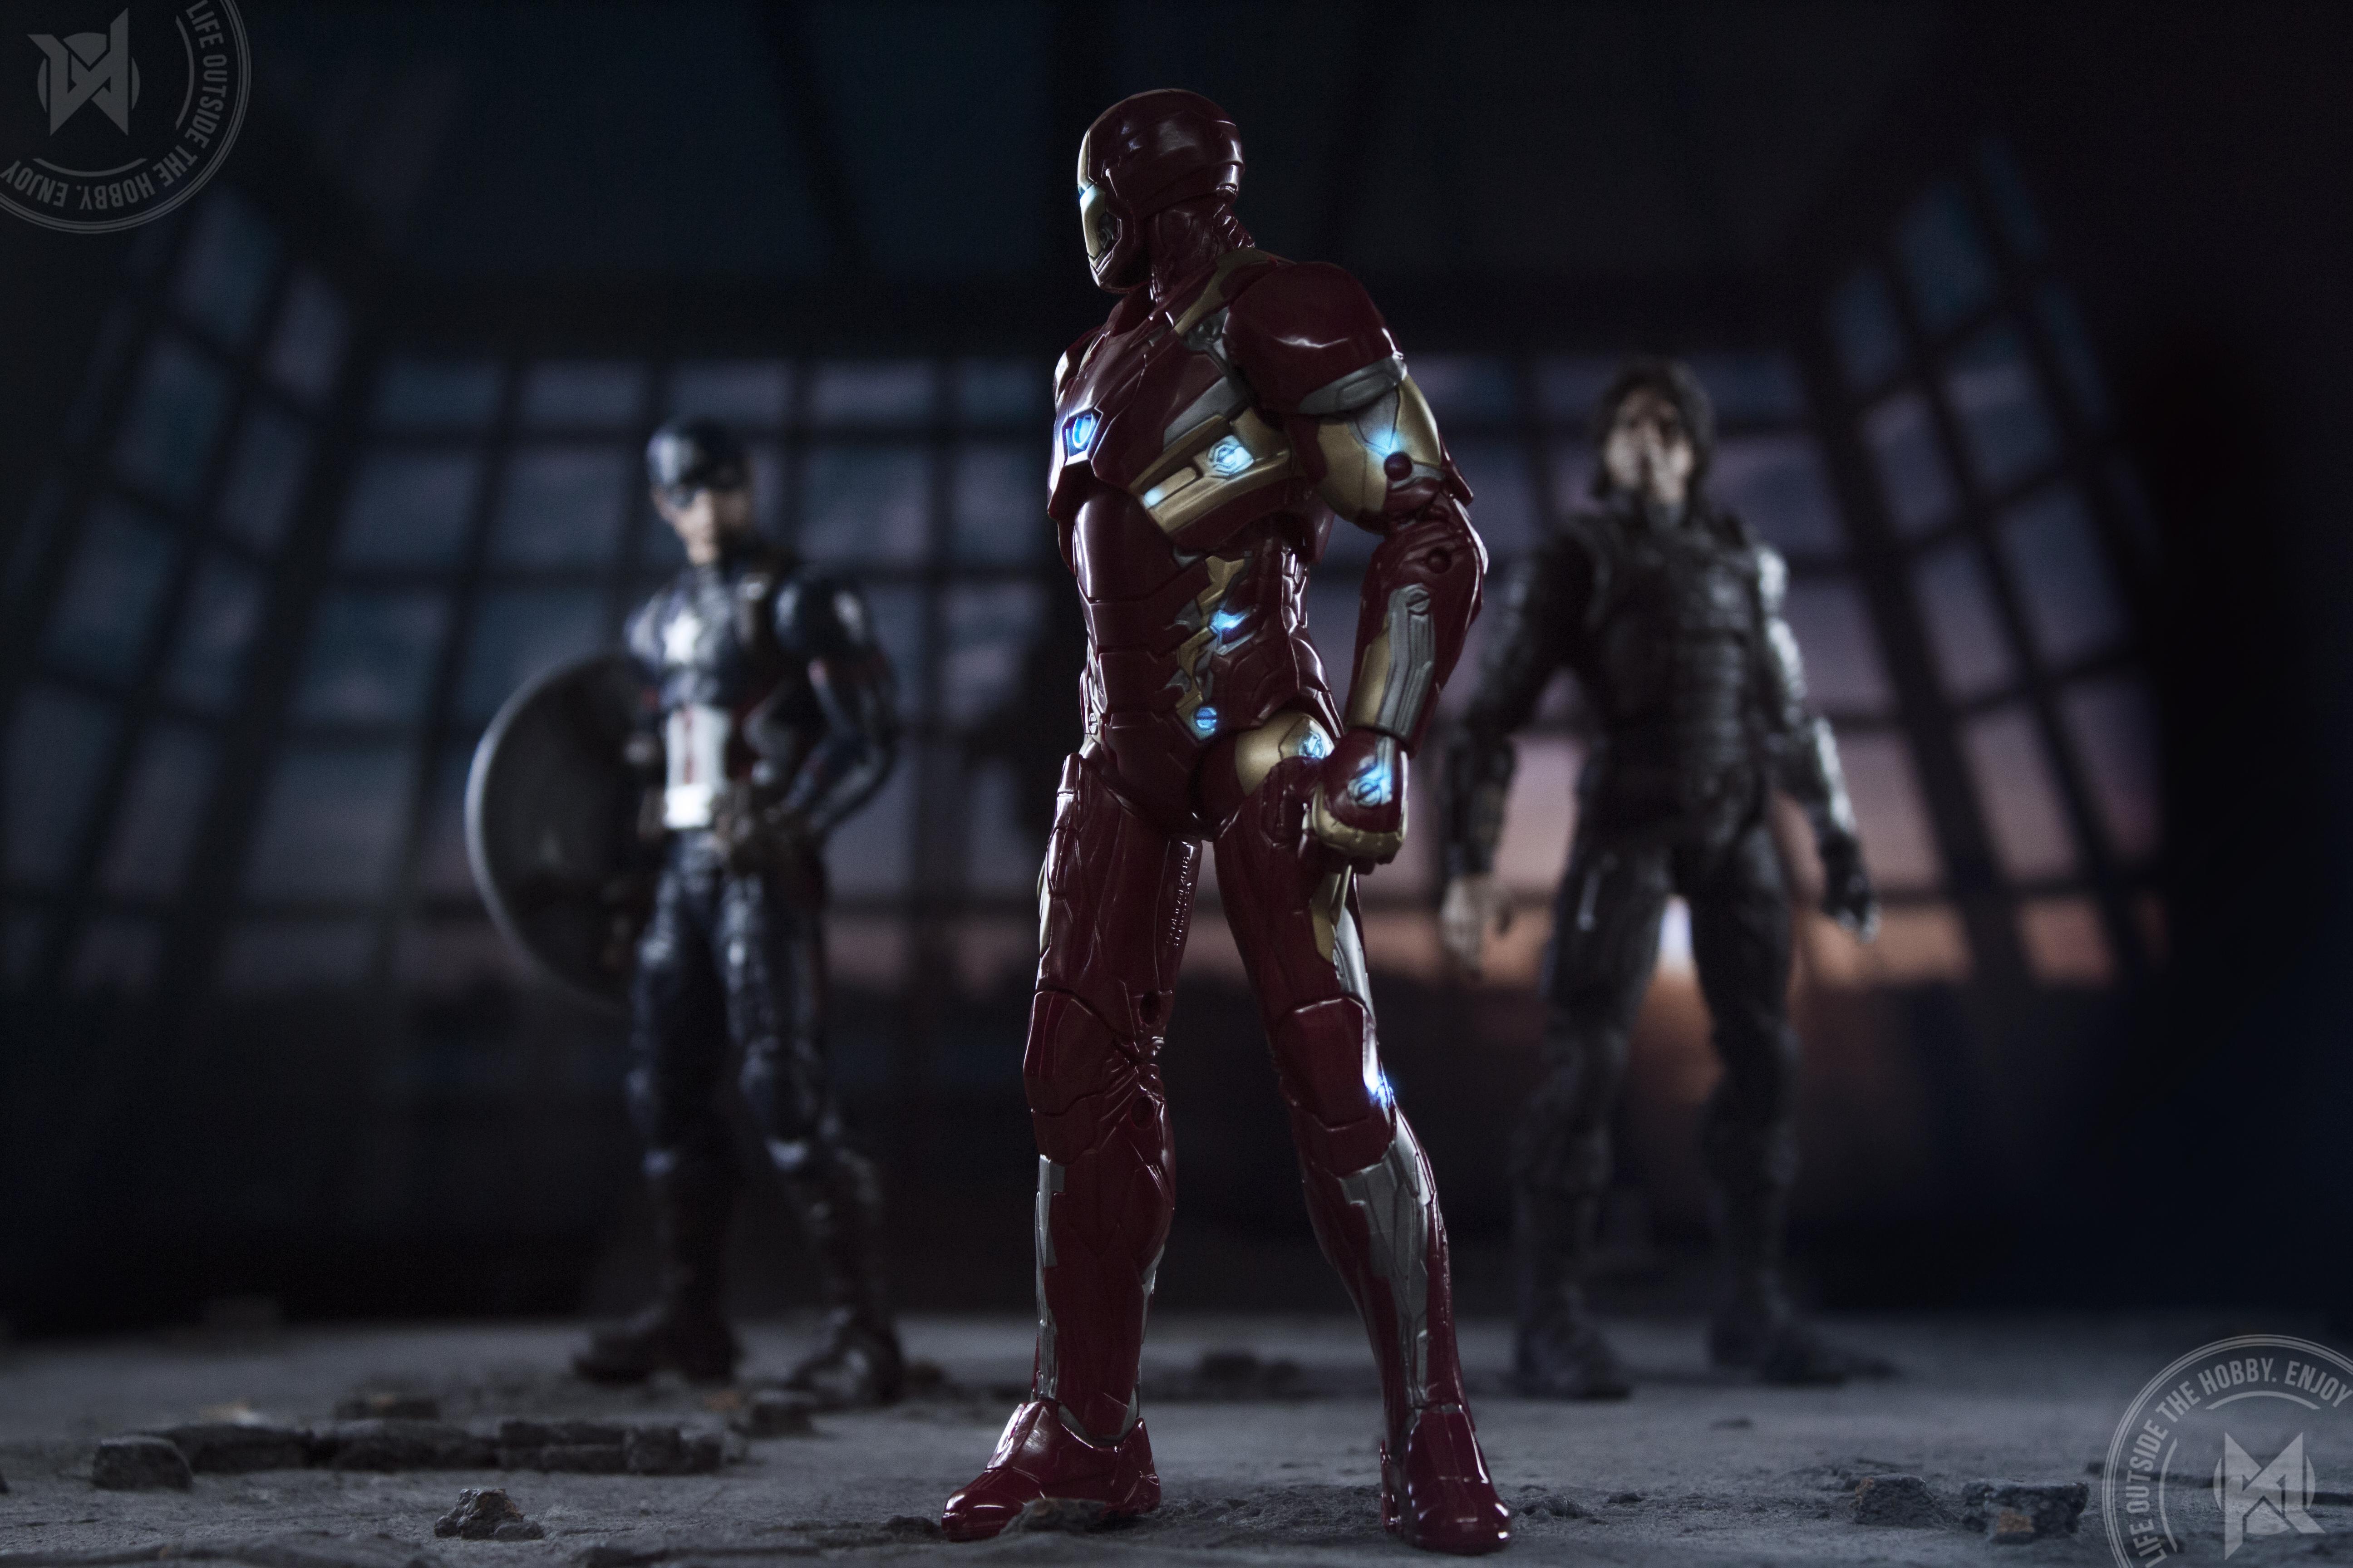 Wallpaper Photography Movies Superhero Iron Man Daredevil